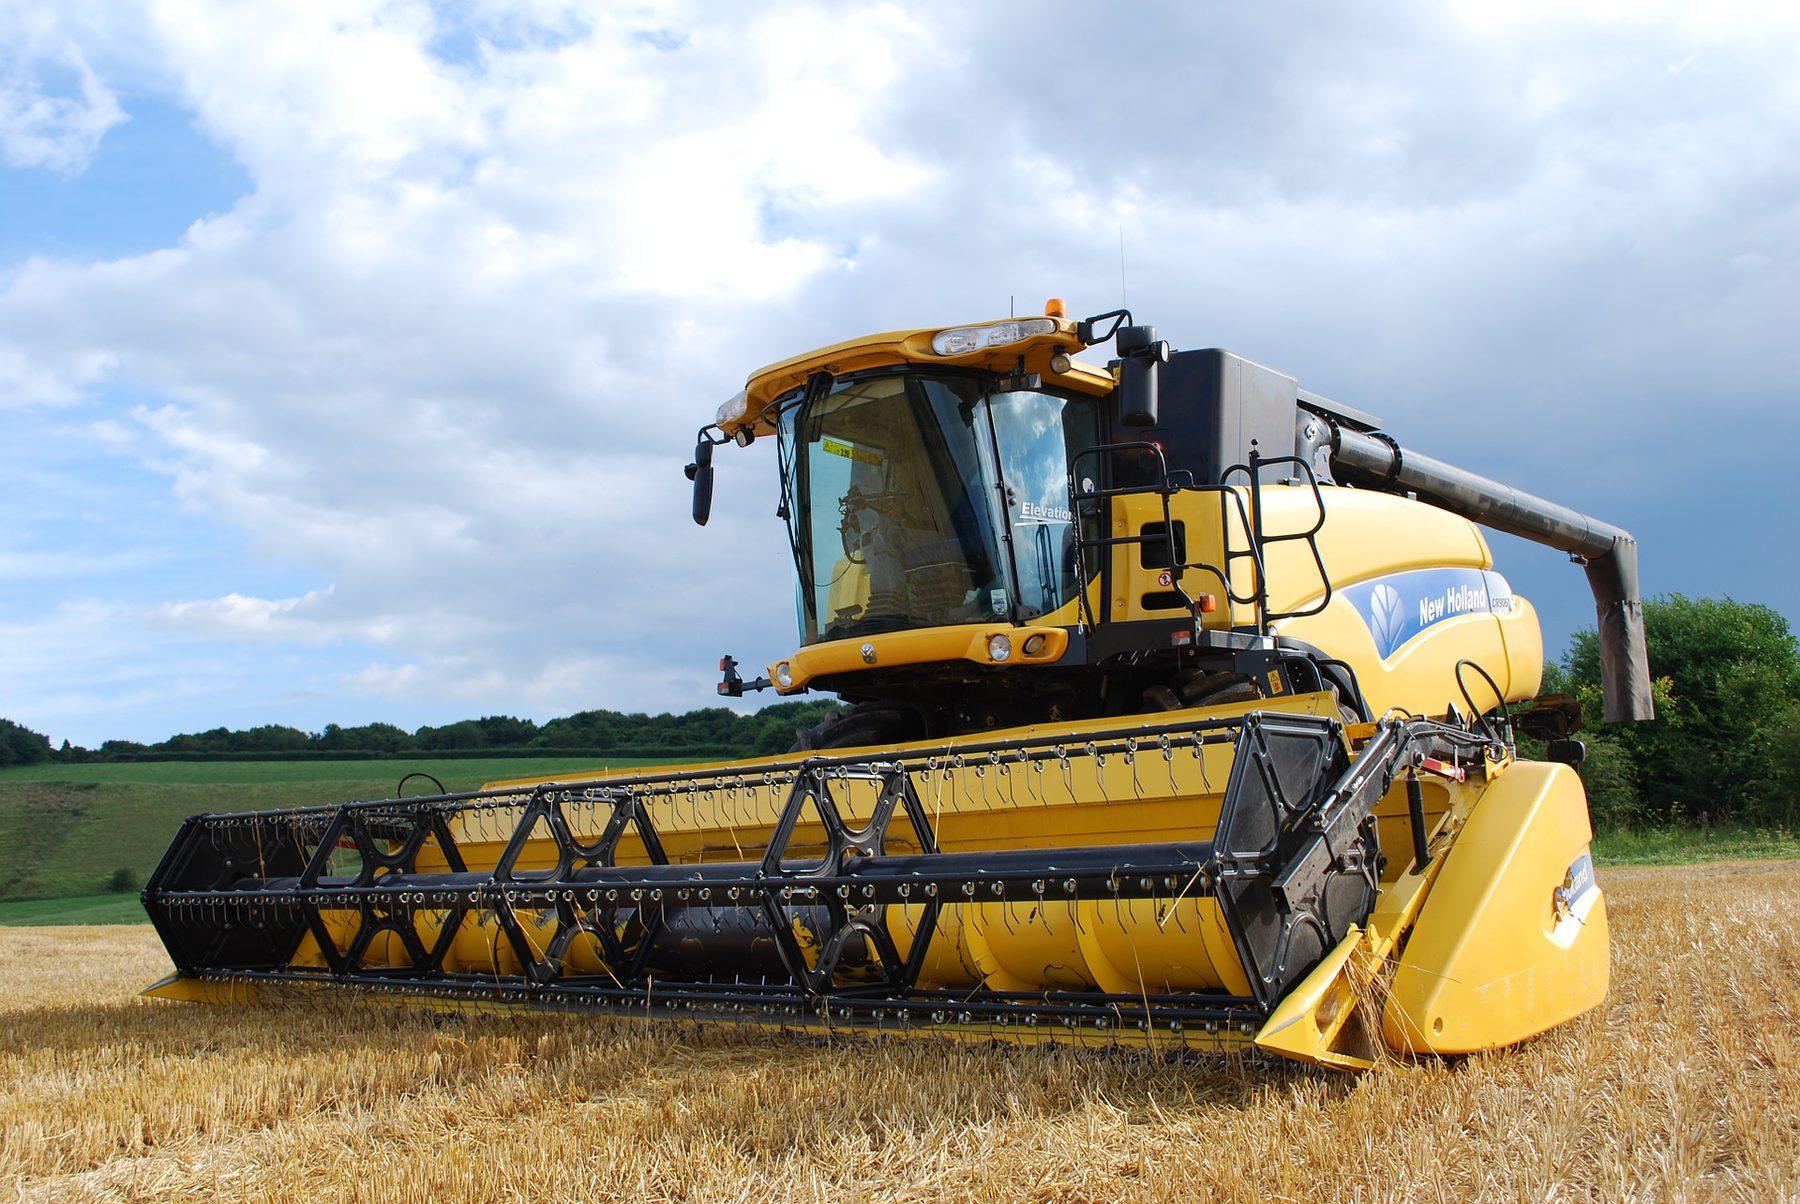 Agritech (Sector Header: Combine Harvester)